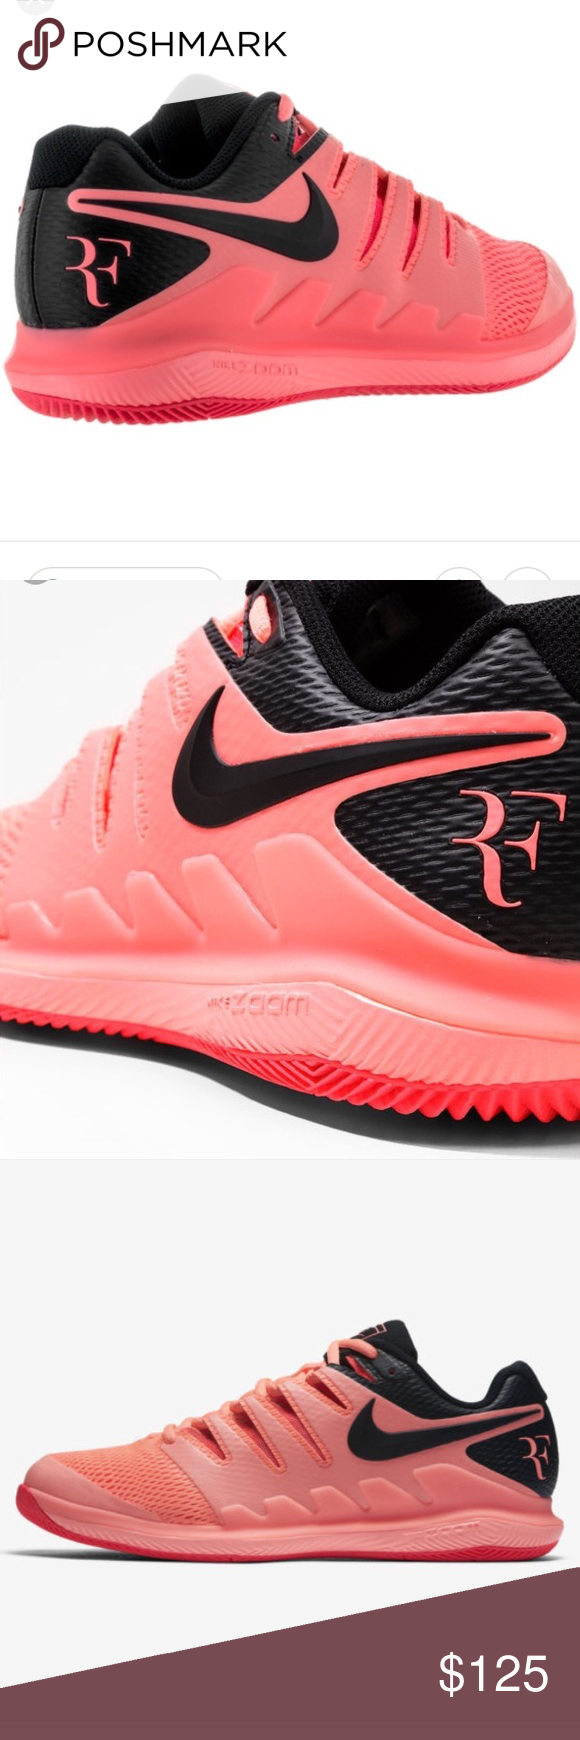 6533786012b Nike AA8030 660 Air Zoom Vapor x HV Lava Glow NWOB New Nike AA8030 660 Air  Zoom Vapor x HC Lava Glow Roger Federer sneakers in size 7.5 Nike Shoes